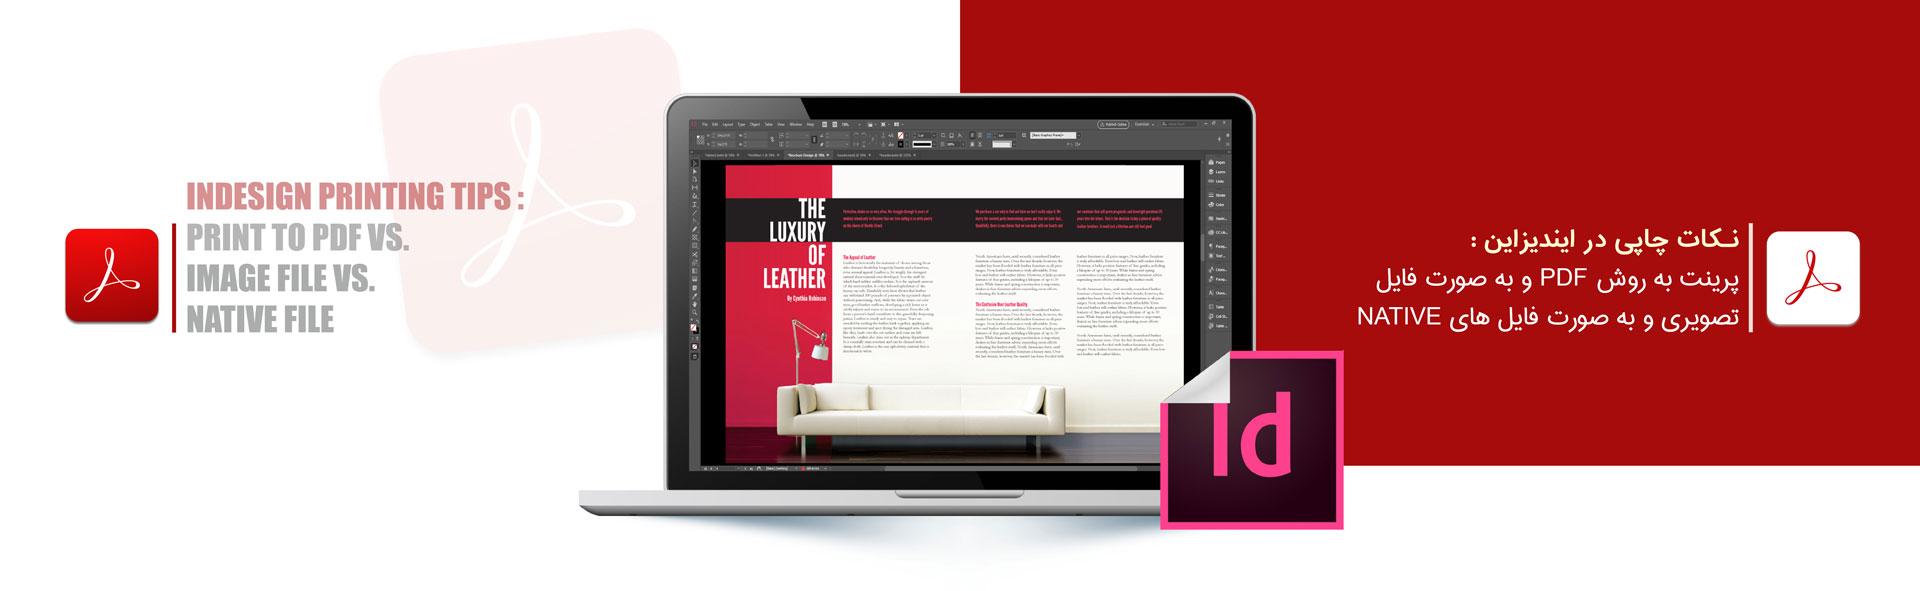 INDESIGN PRINTING TIPS PRINT TO PDF VS IMAGE FILE VS NATIVE FILE 1 - پرینت در ایندیزاین به روش های PDF